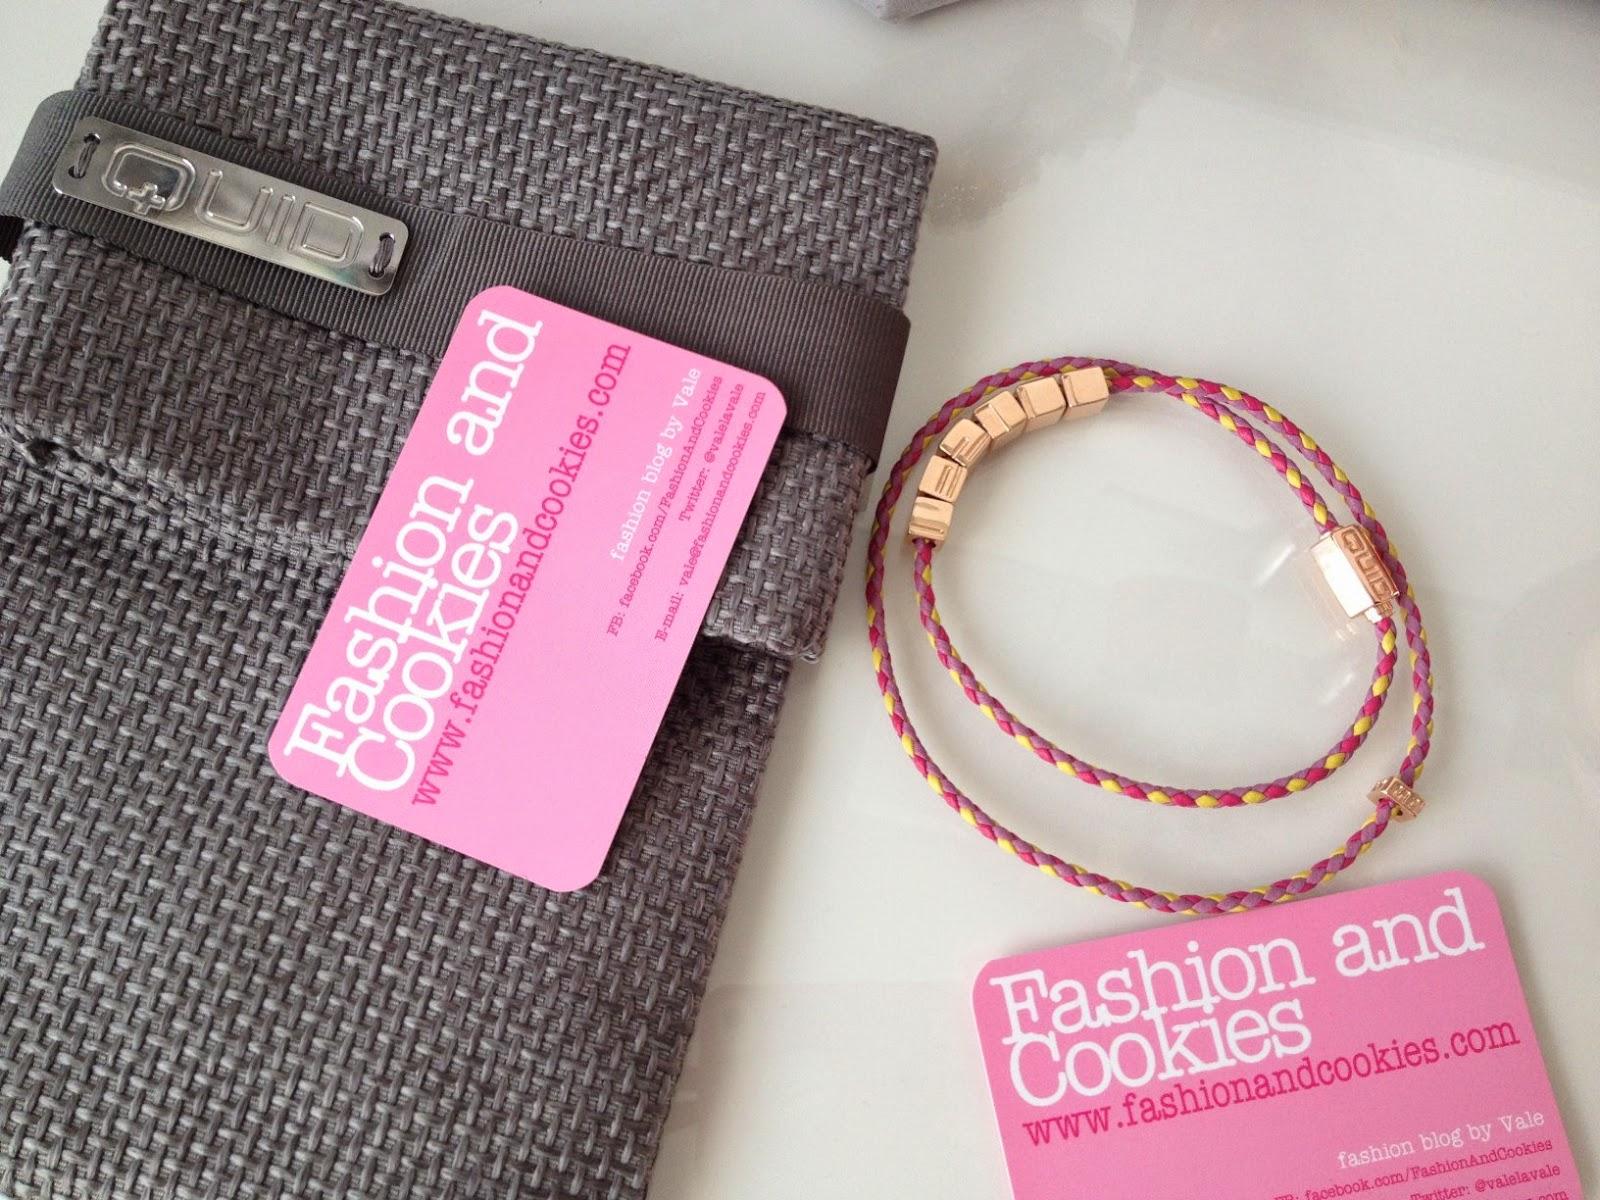 quid numeri primi jewelry to remember, Fashion and Cookies, fashion blogger